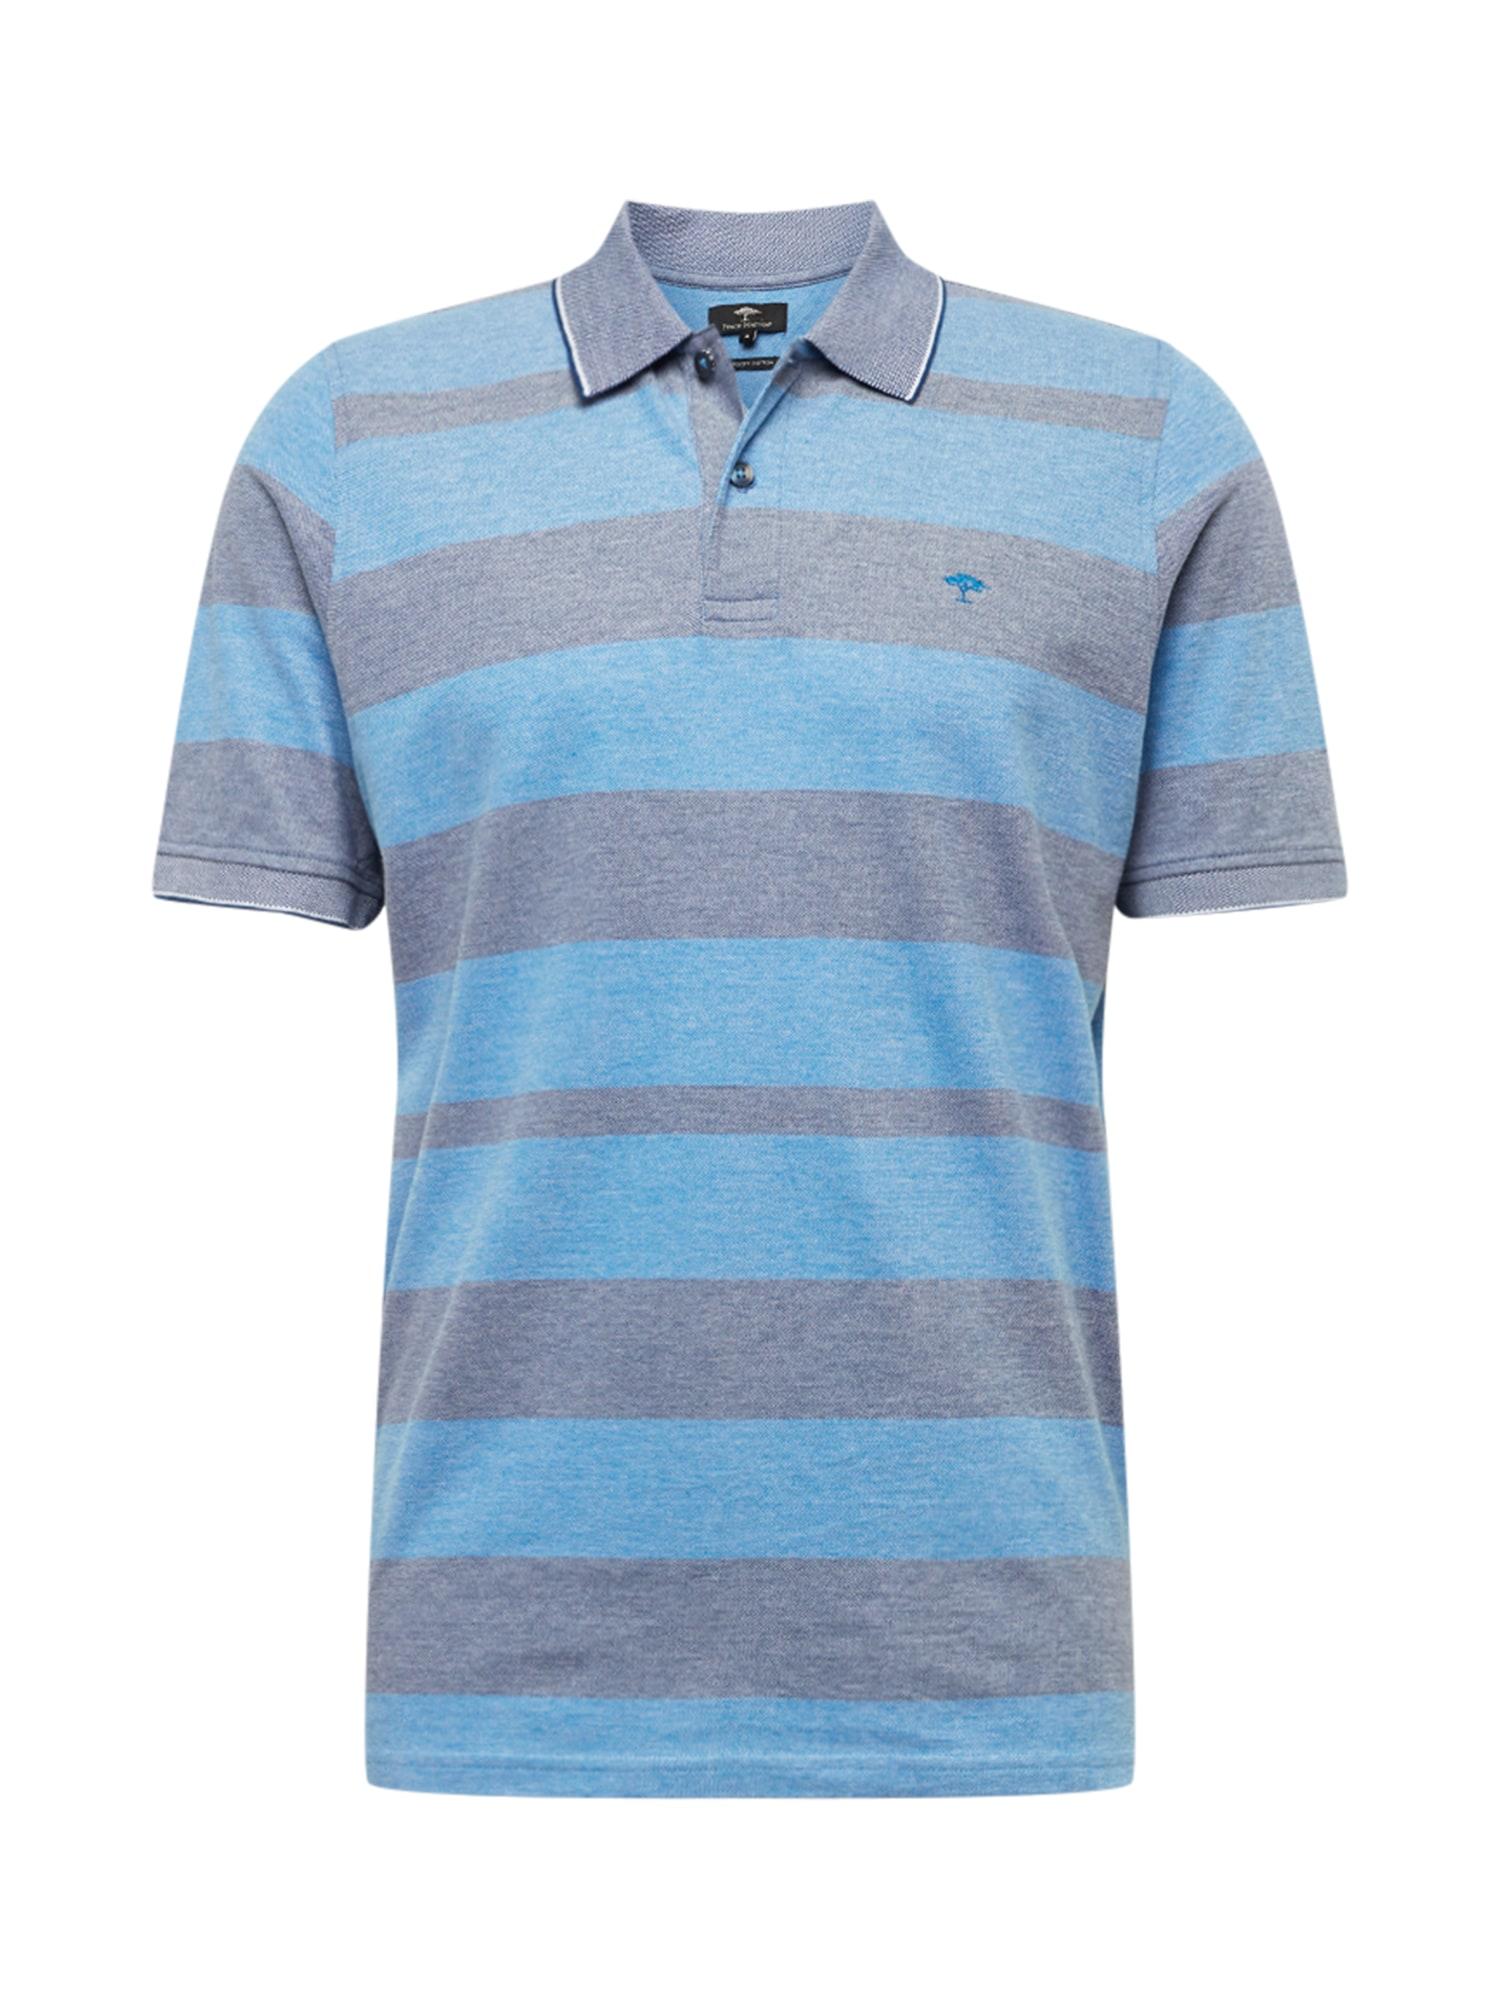 FYNCH-HATTON Marškinėliai turkio spalva / melsvai pilka